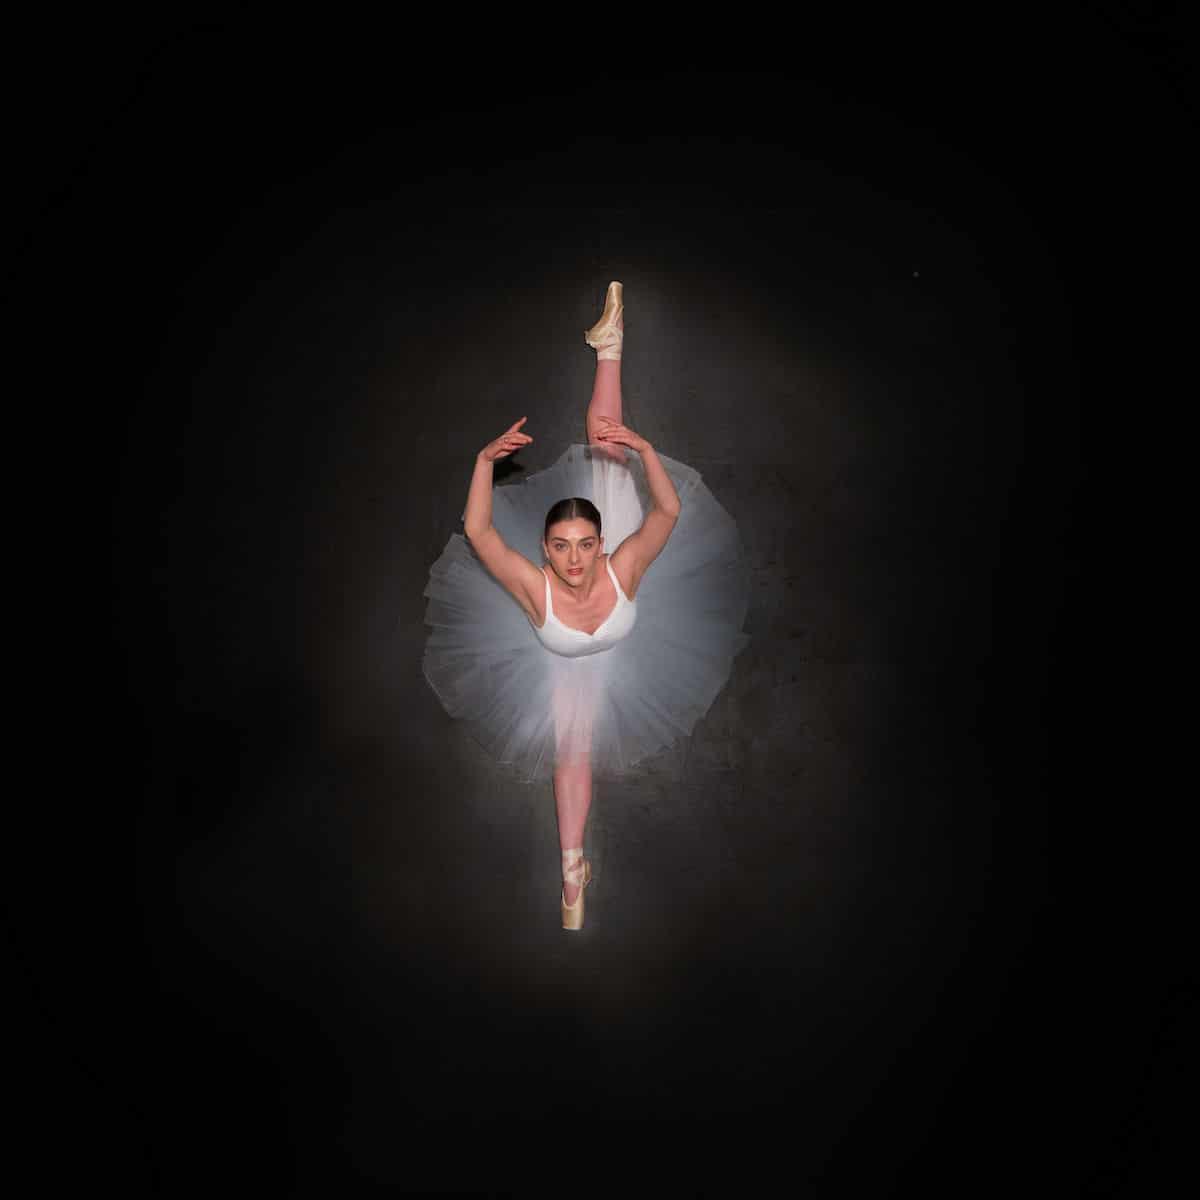 Overhead Photo of a Ballerina